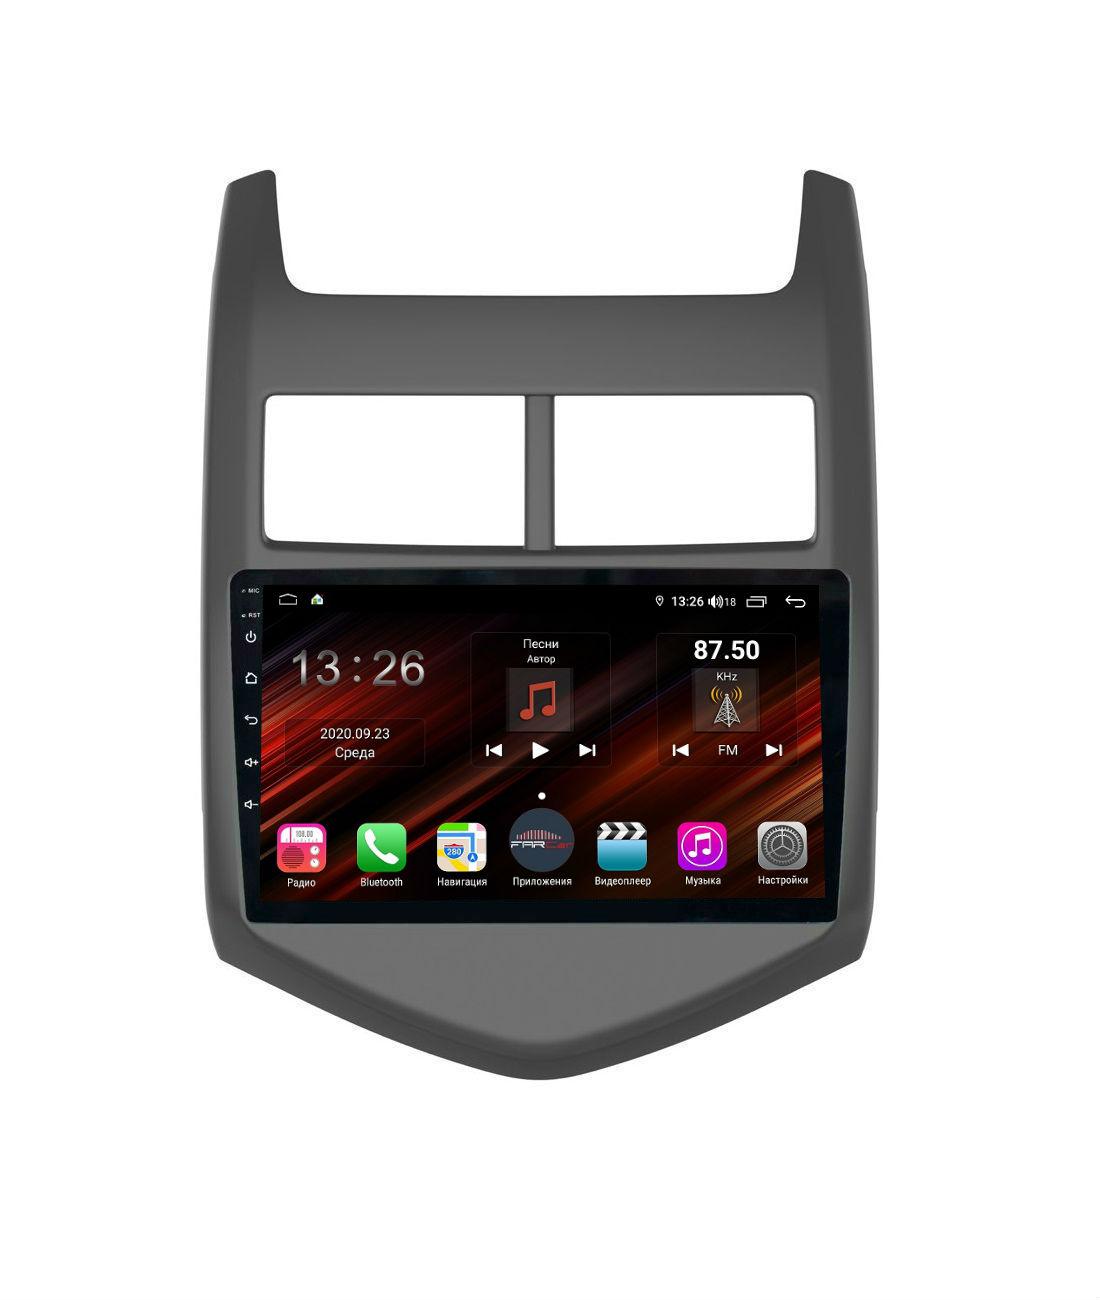 Штатная магнитола FarCar s400 Super HD для Chevrolet Aveo на Android (XH107R) (+ Камера заднего вида в подарок!)